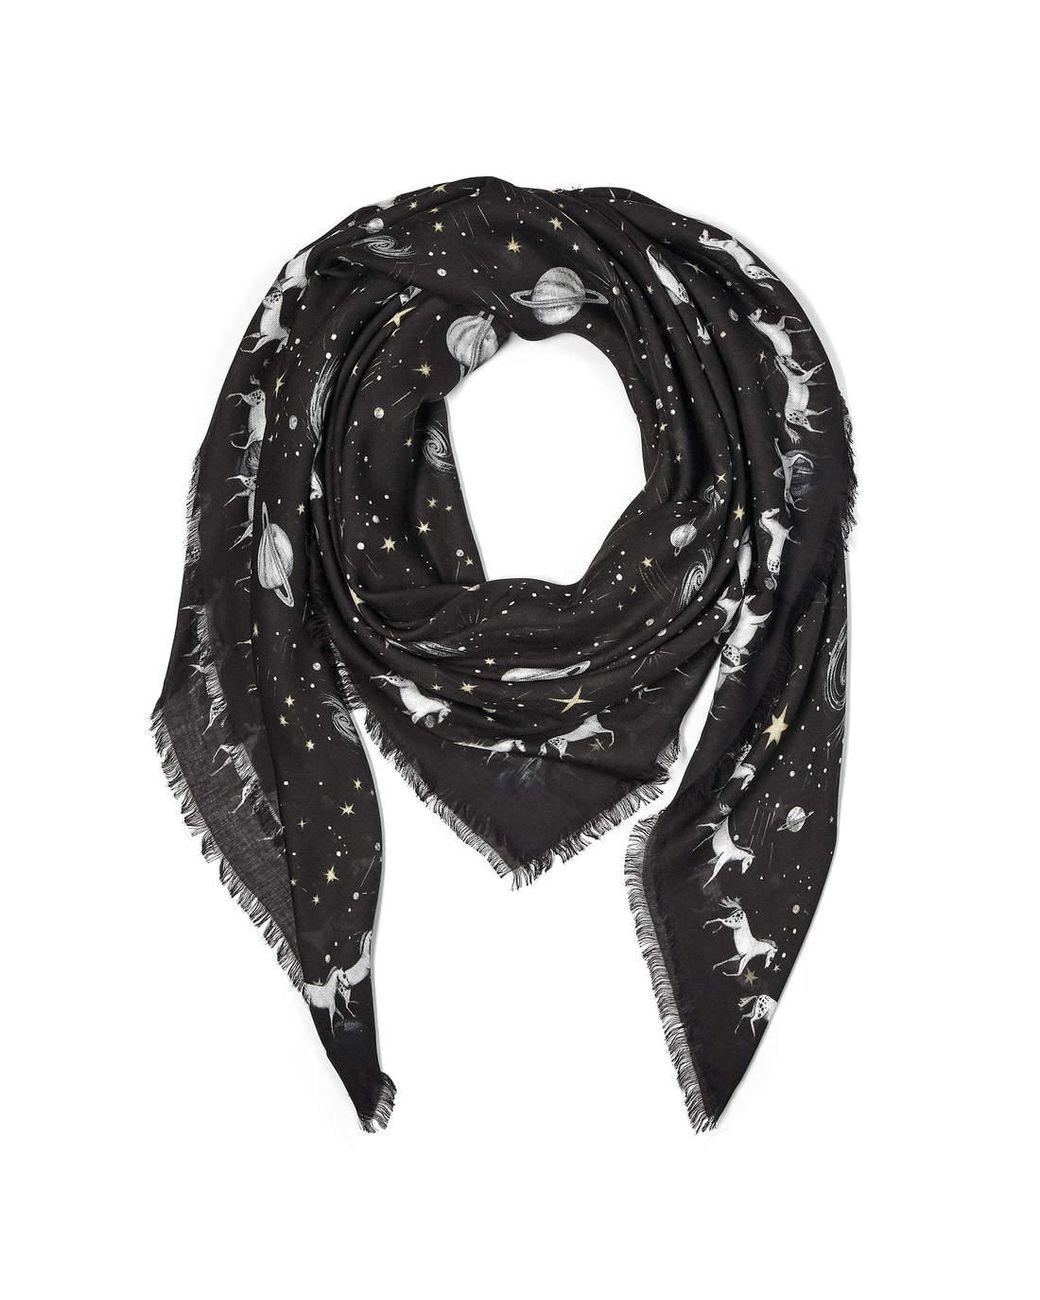 6510bf57cc95e Aspinal of London Ladies Versatile Black Pegasus Constellation Cashmere  Blend Scarf in Black - Save 24% - Lyst